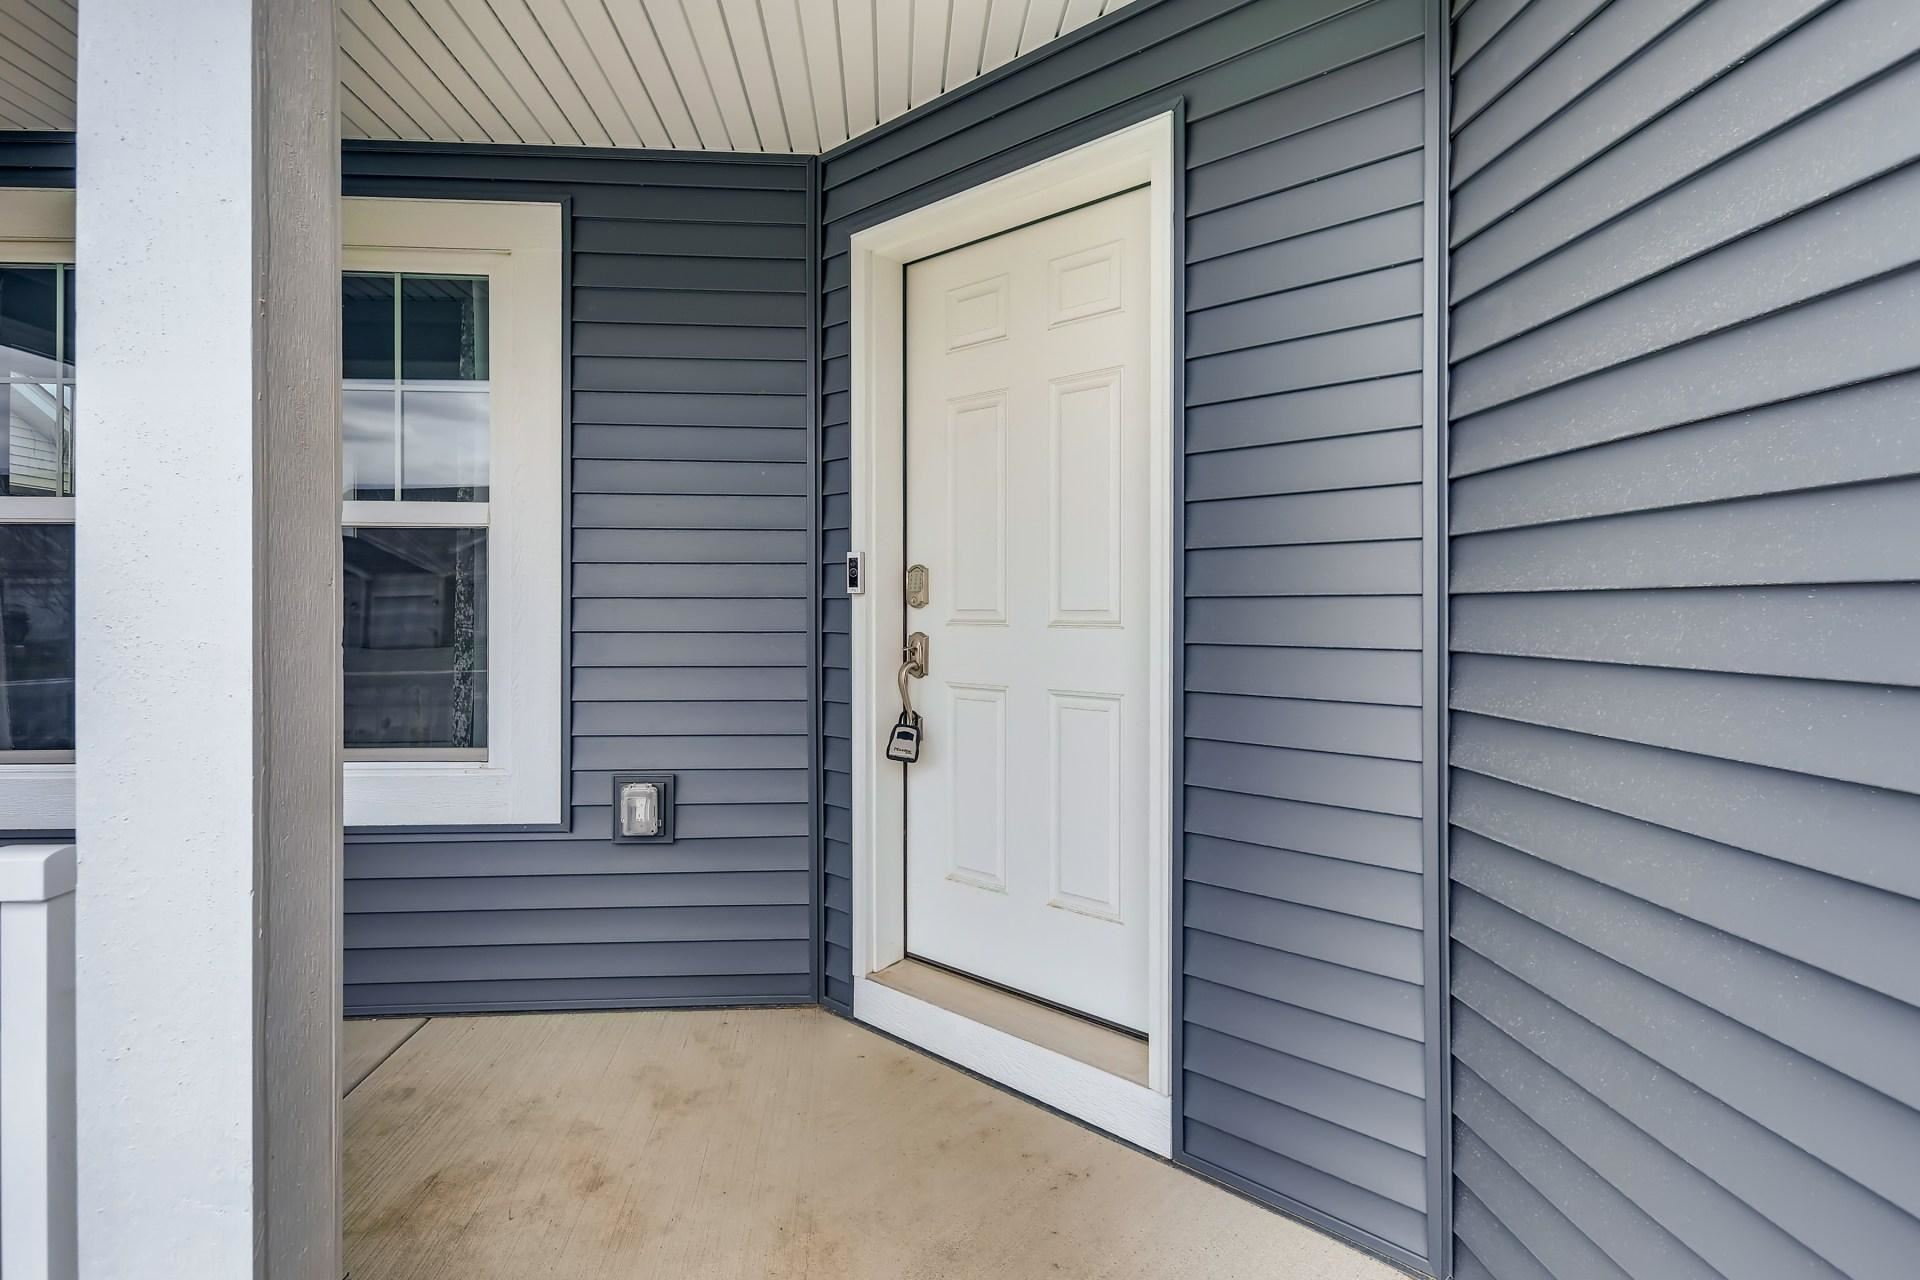 Photo of 13824 Anderson Drive, Rosemount, MN 55068 (MLS # 5751753)